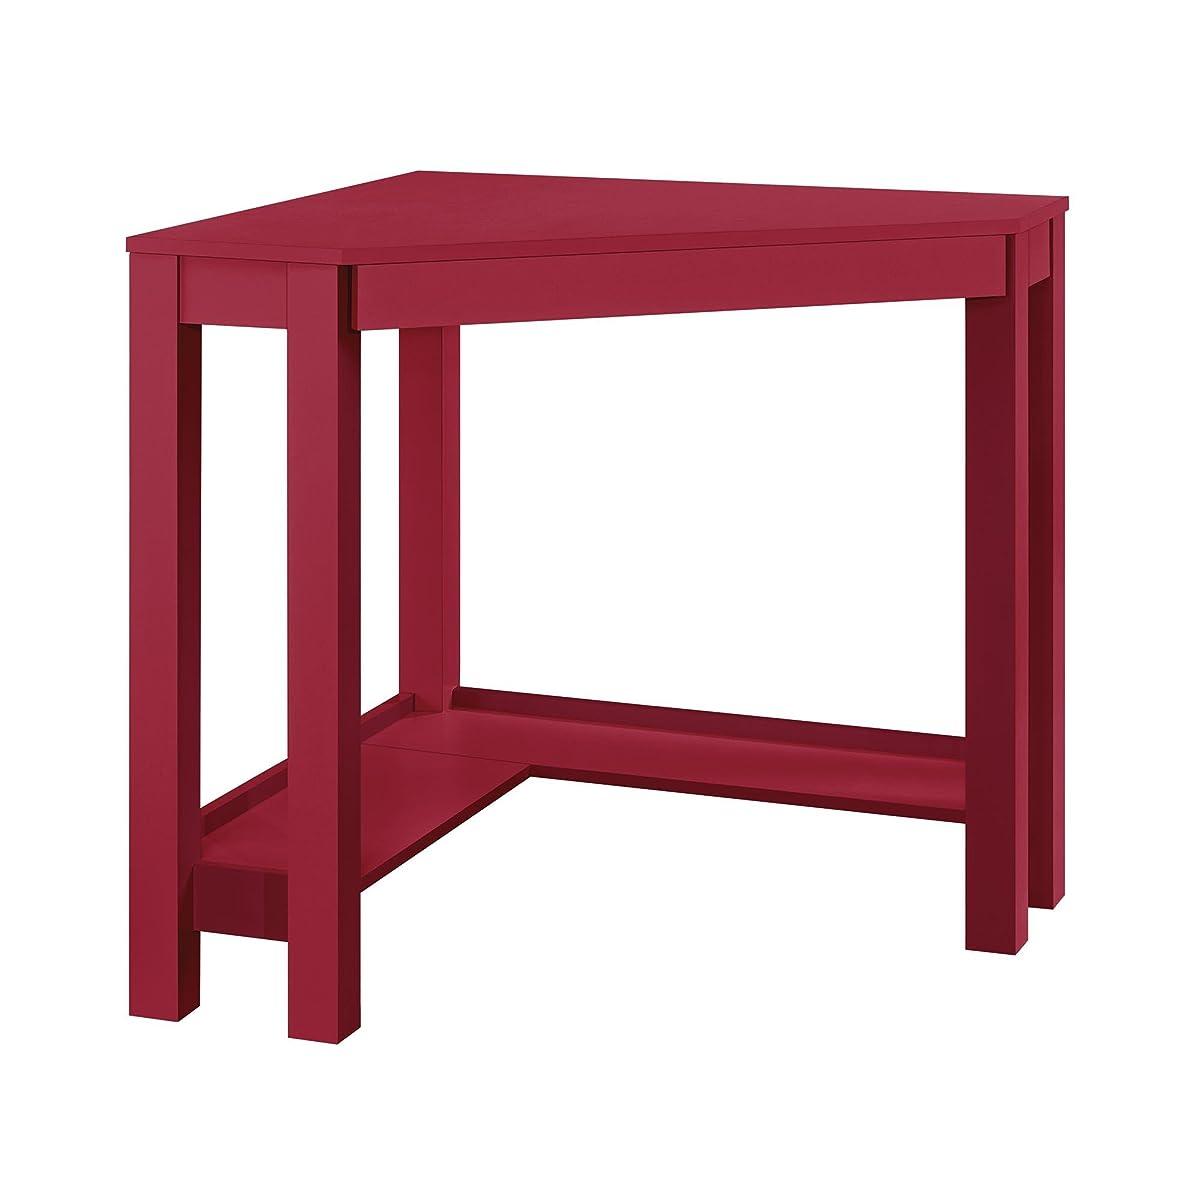 Altra Furniture Parsons Corner Desk, Red